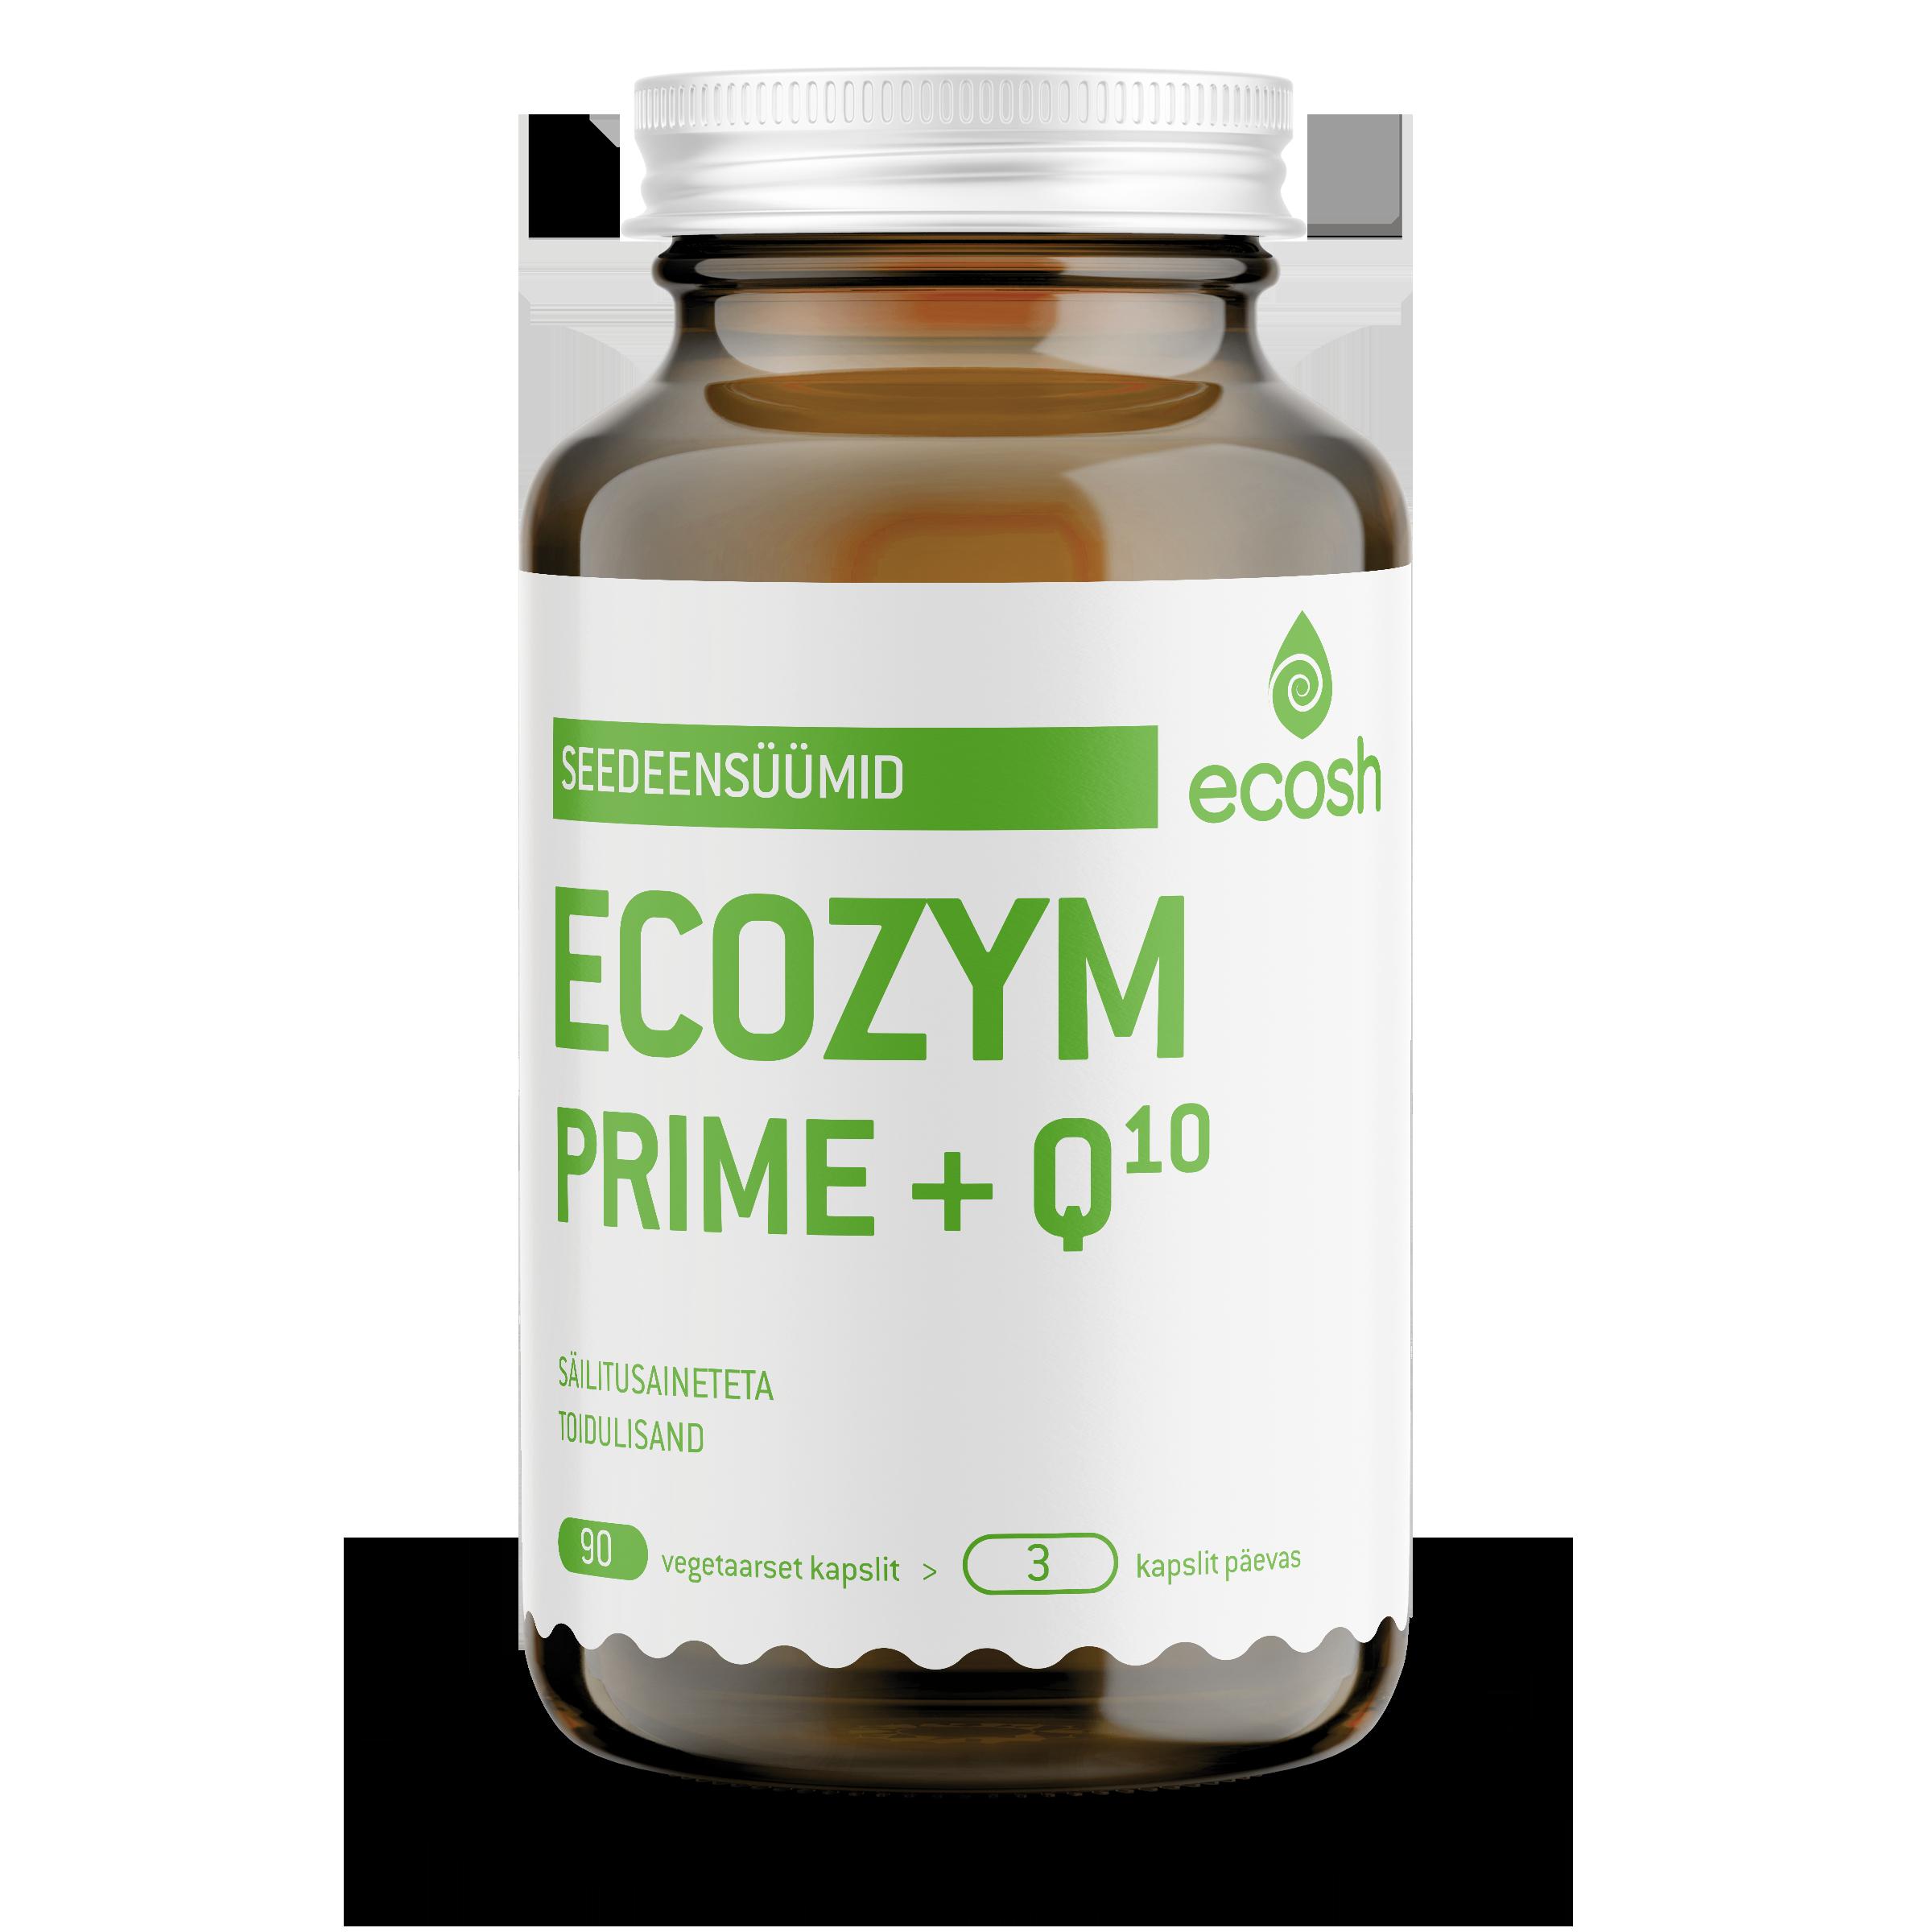 ECOZYM PRIME – Seedeensüümid